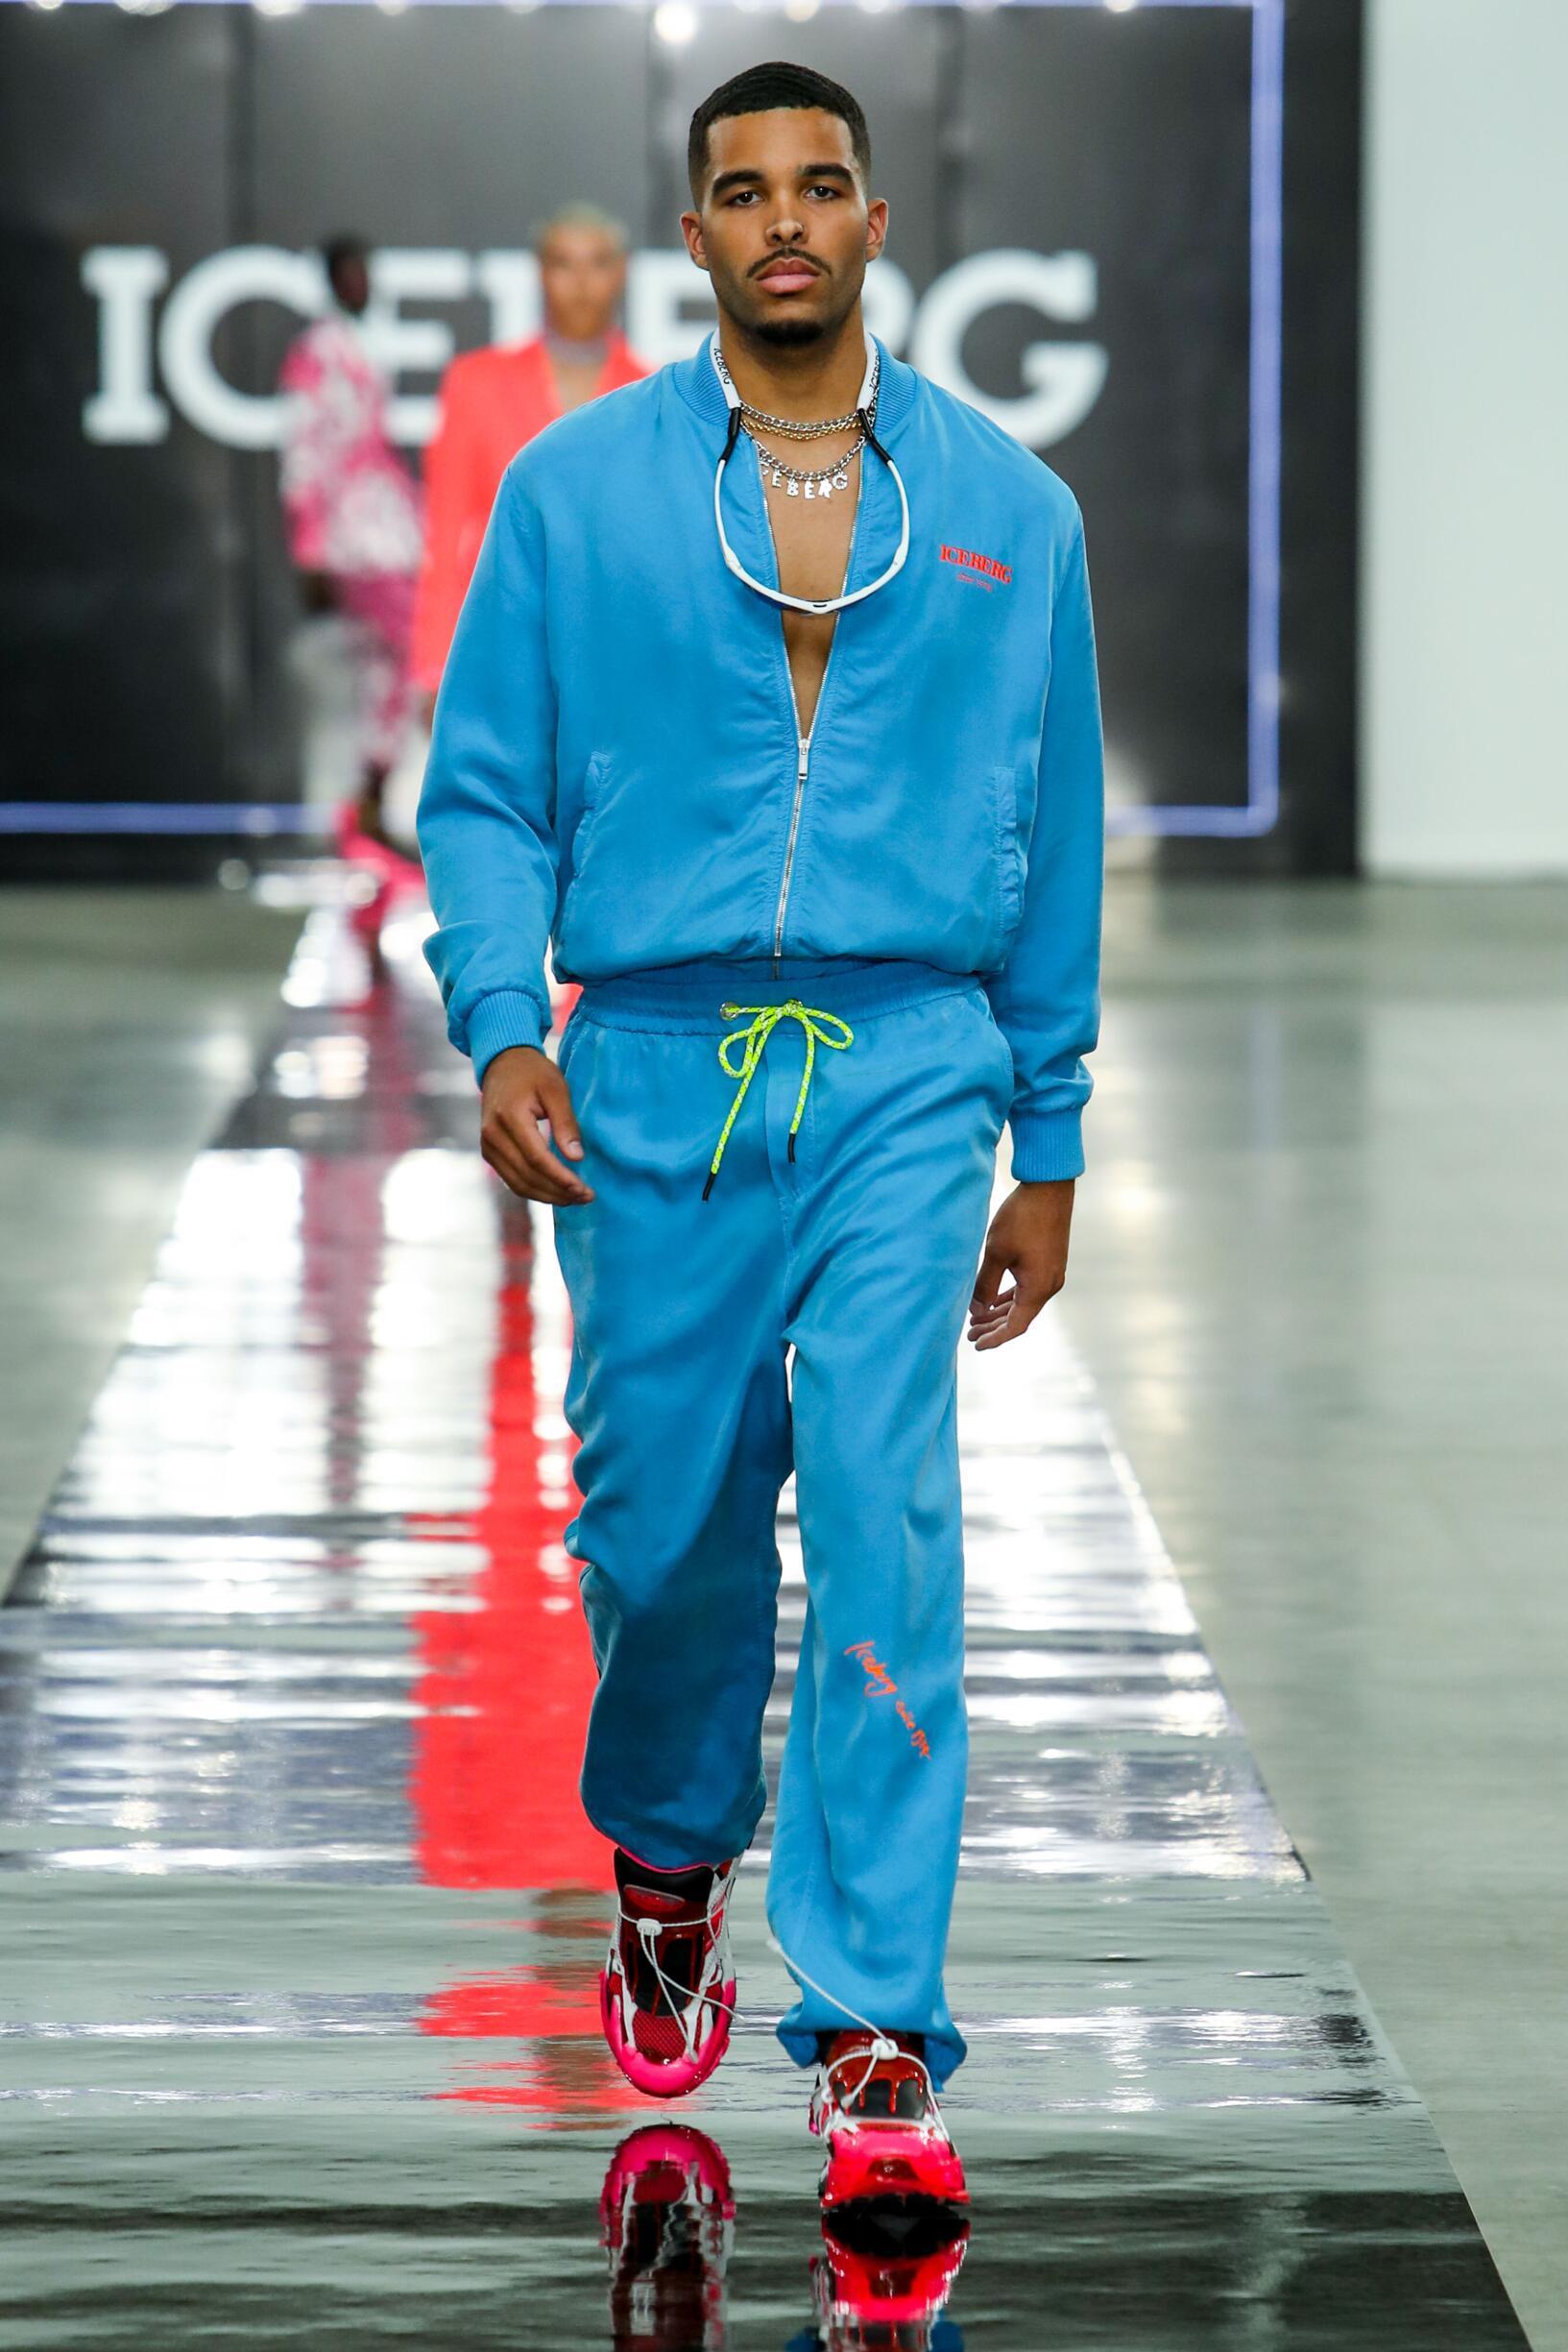 Runway Iceberg Spring Summer 2020 Men's Collection London Fashion Week